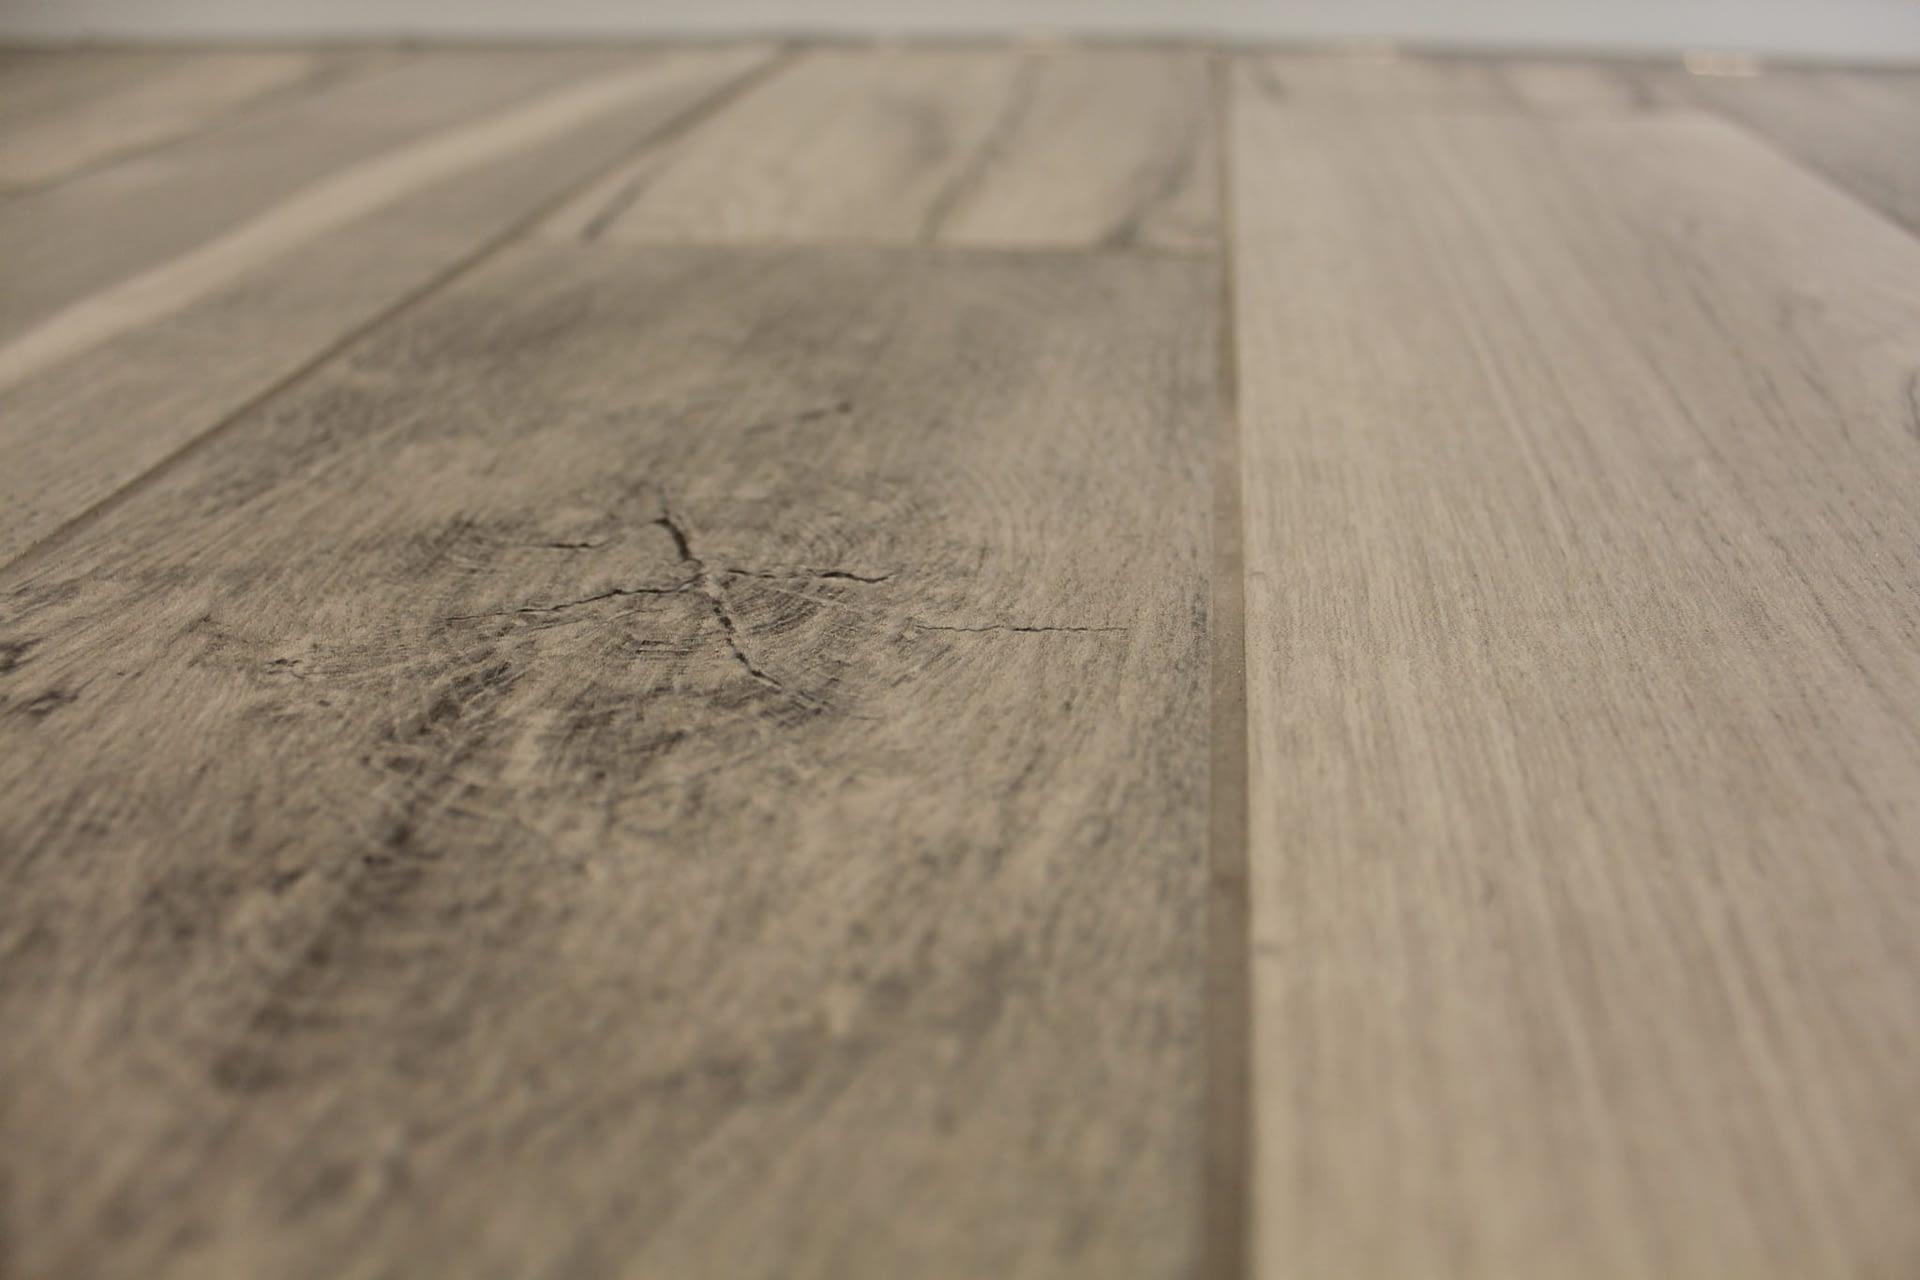 Wood-grain tiles